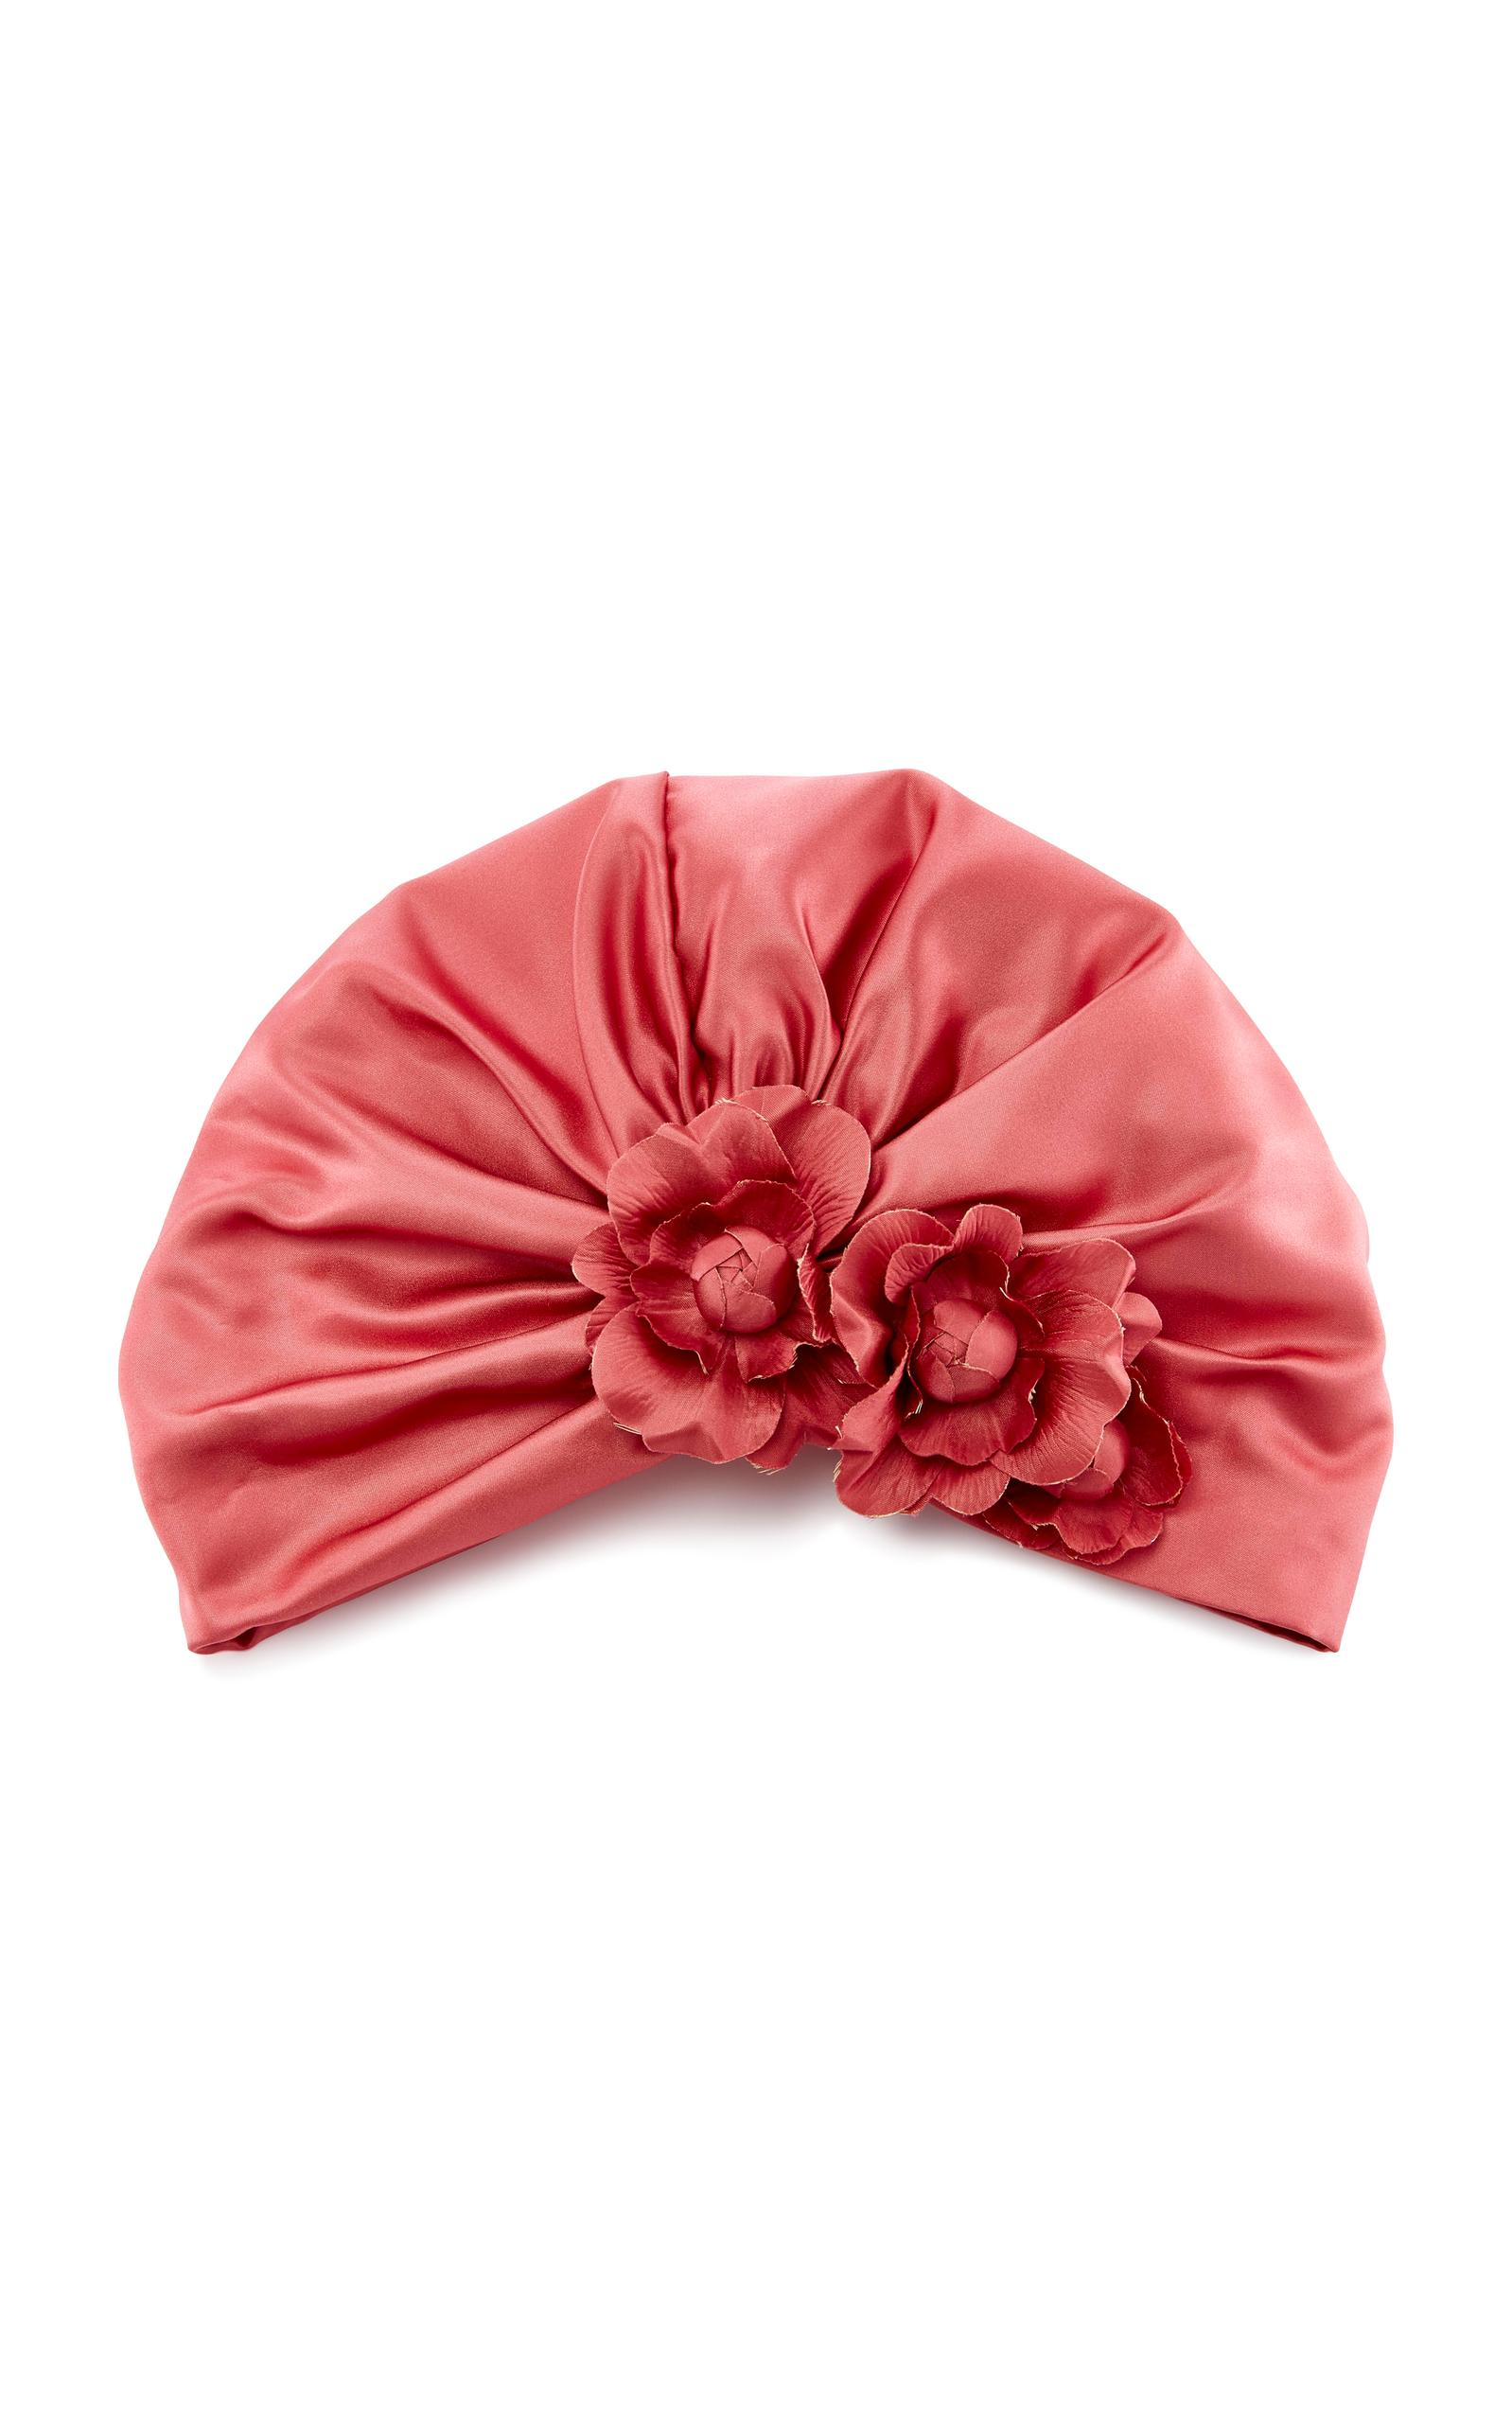 Jennifer Behr Floral Silk-satin Turban In Pink